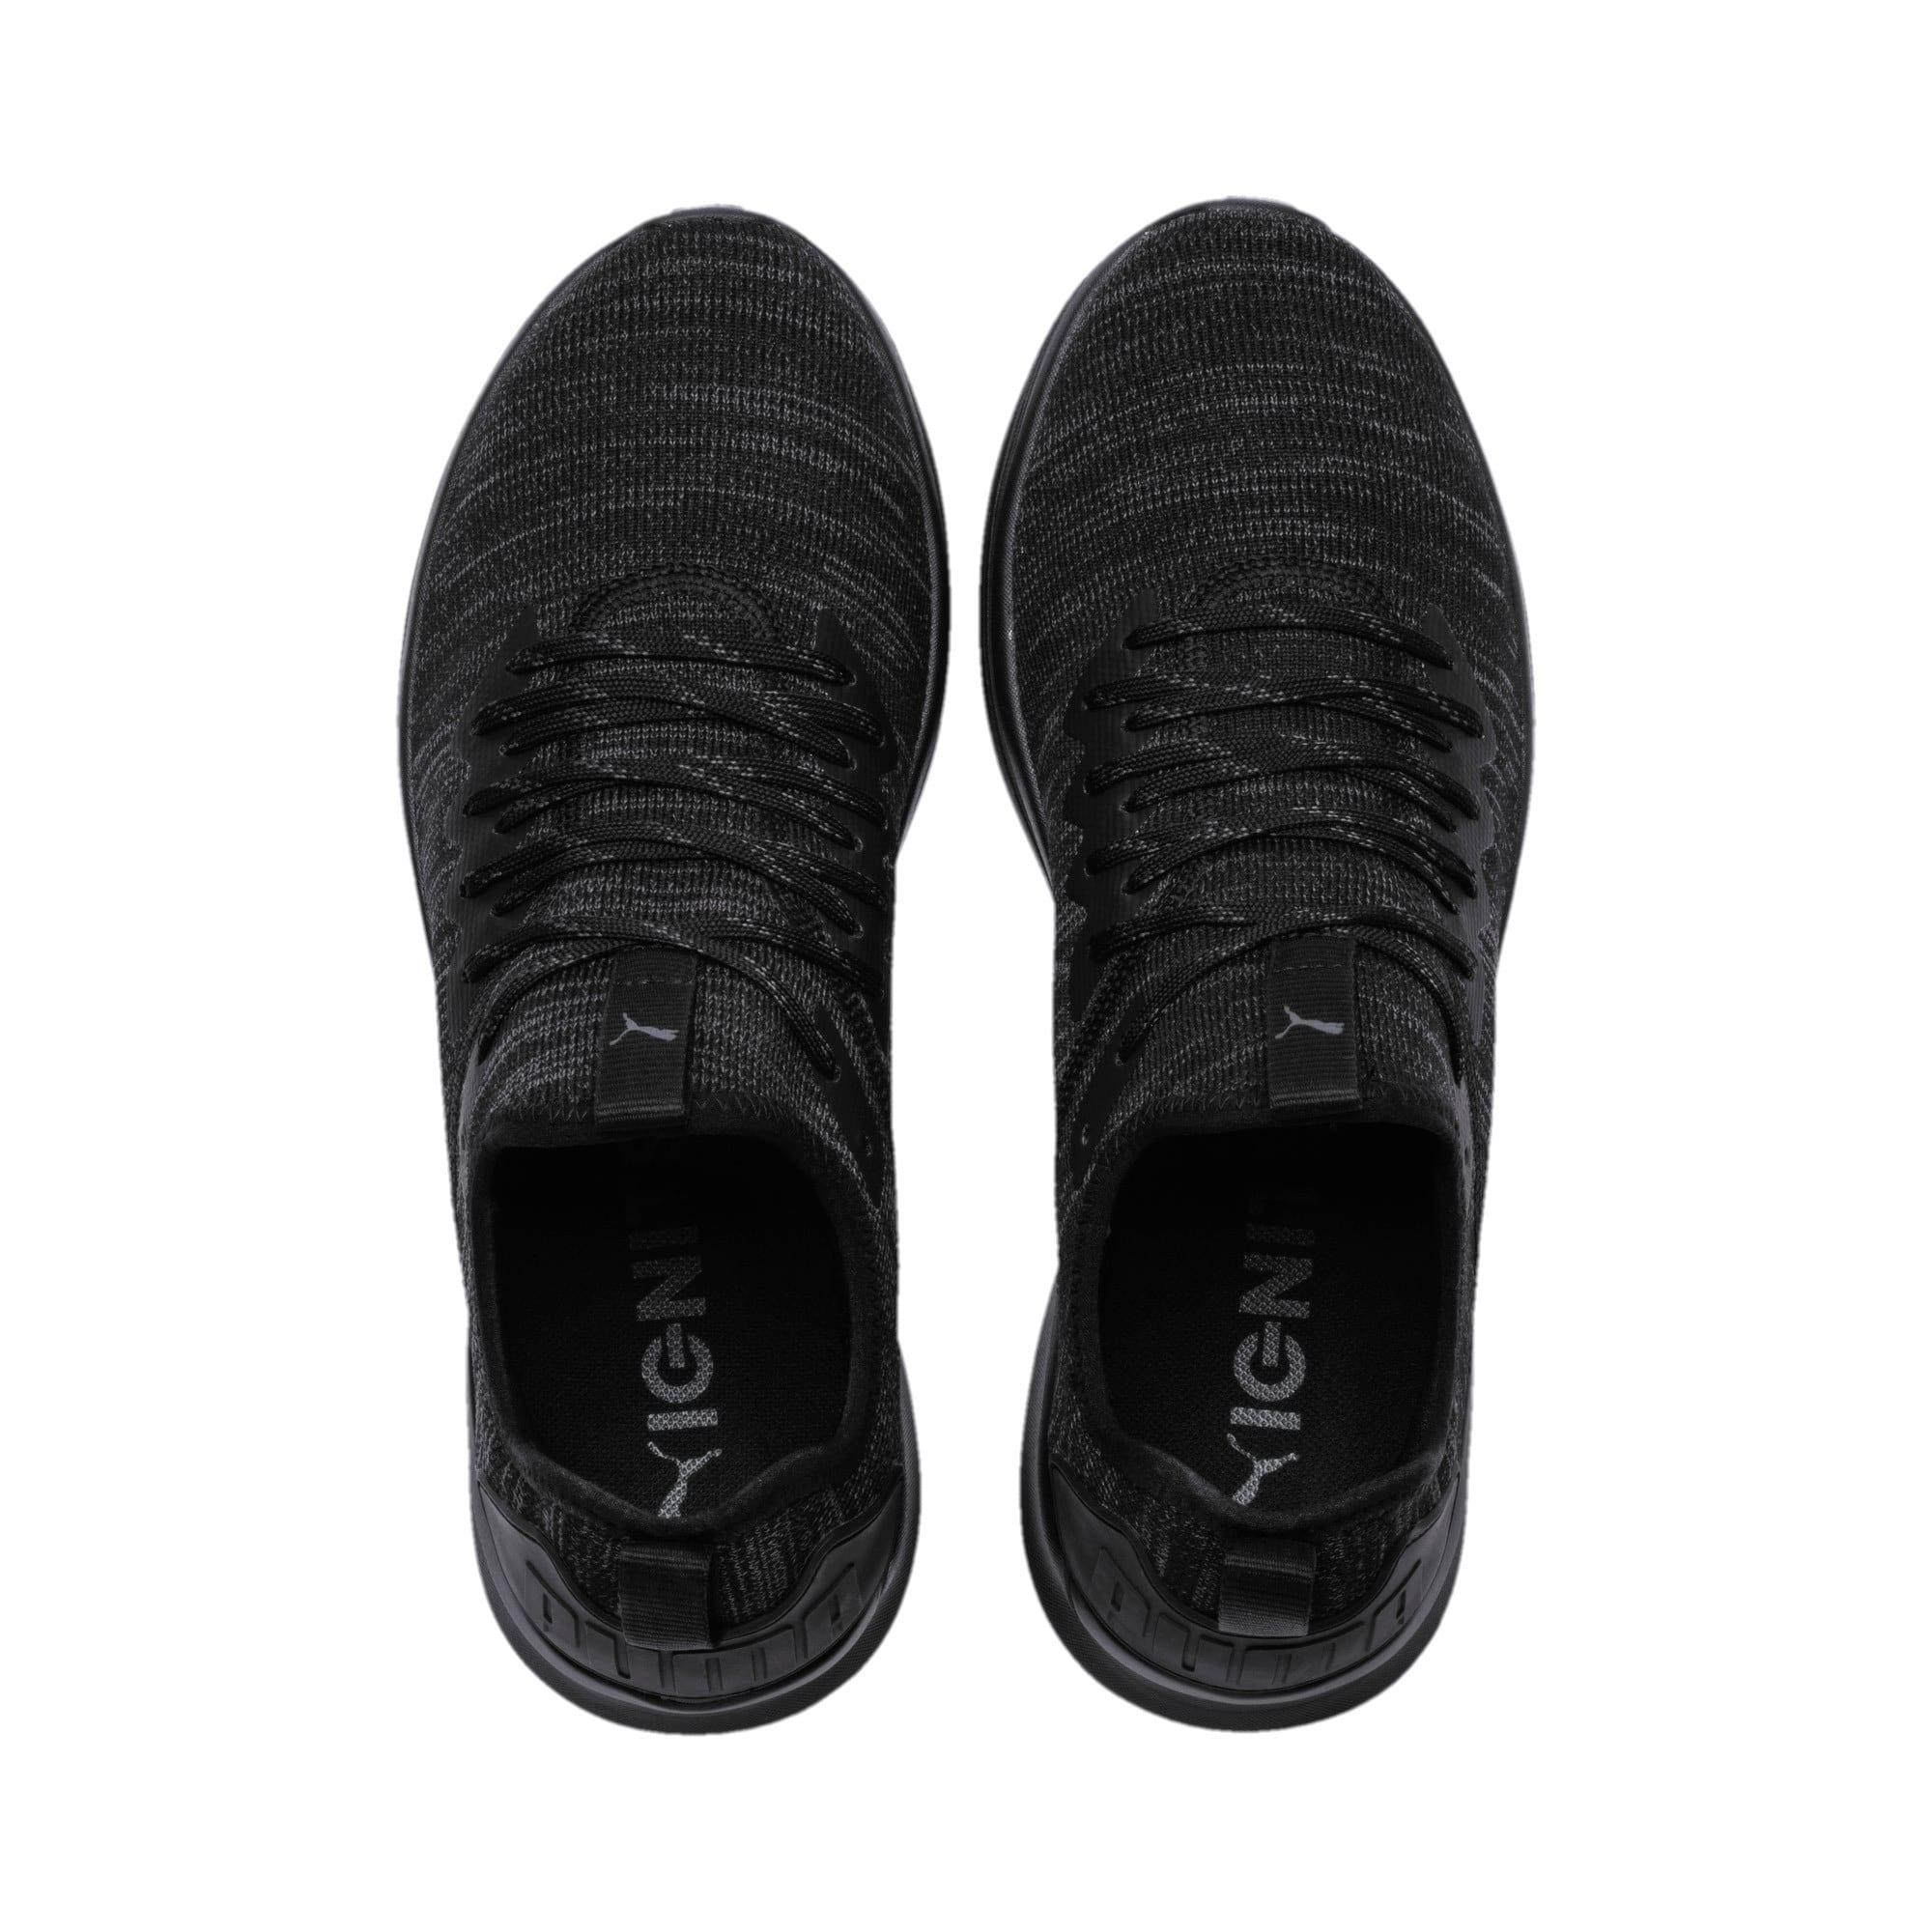 separation shoes 26337 afb33 IGNITE Flash evoKNIT Men's Training Shoes